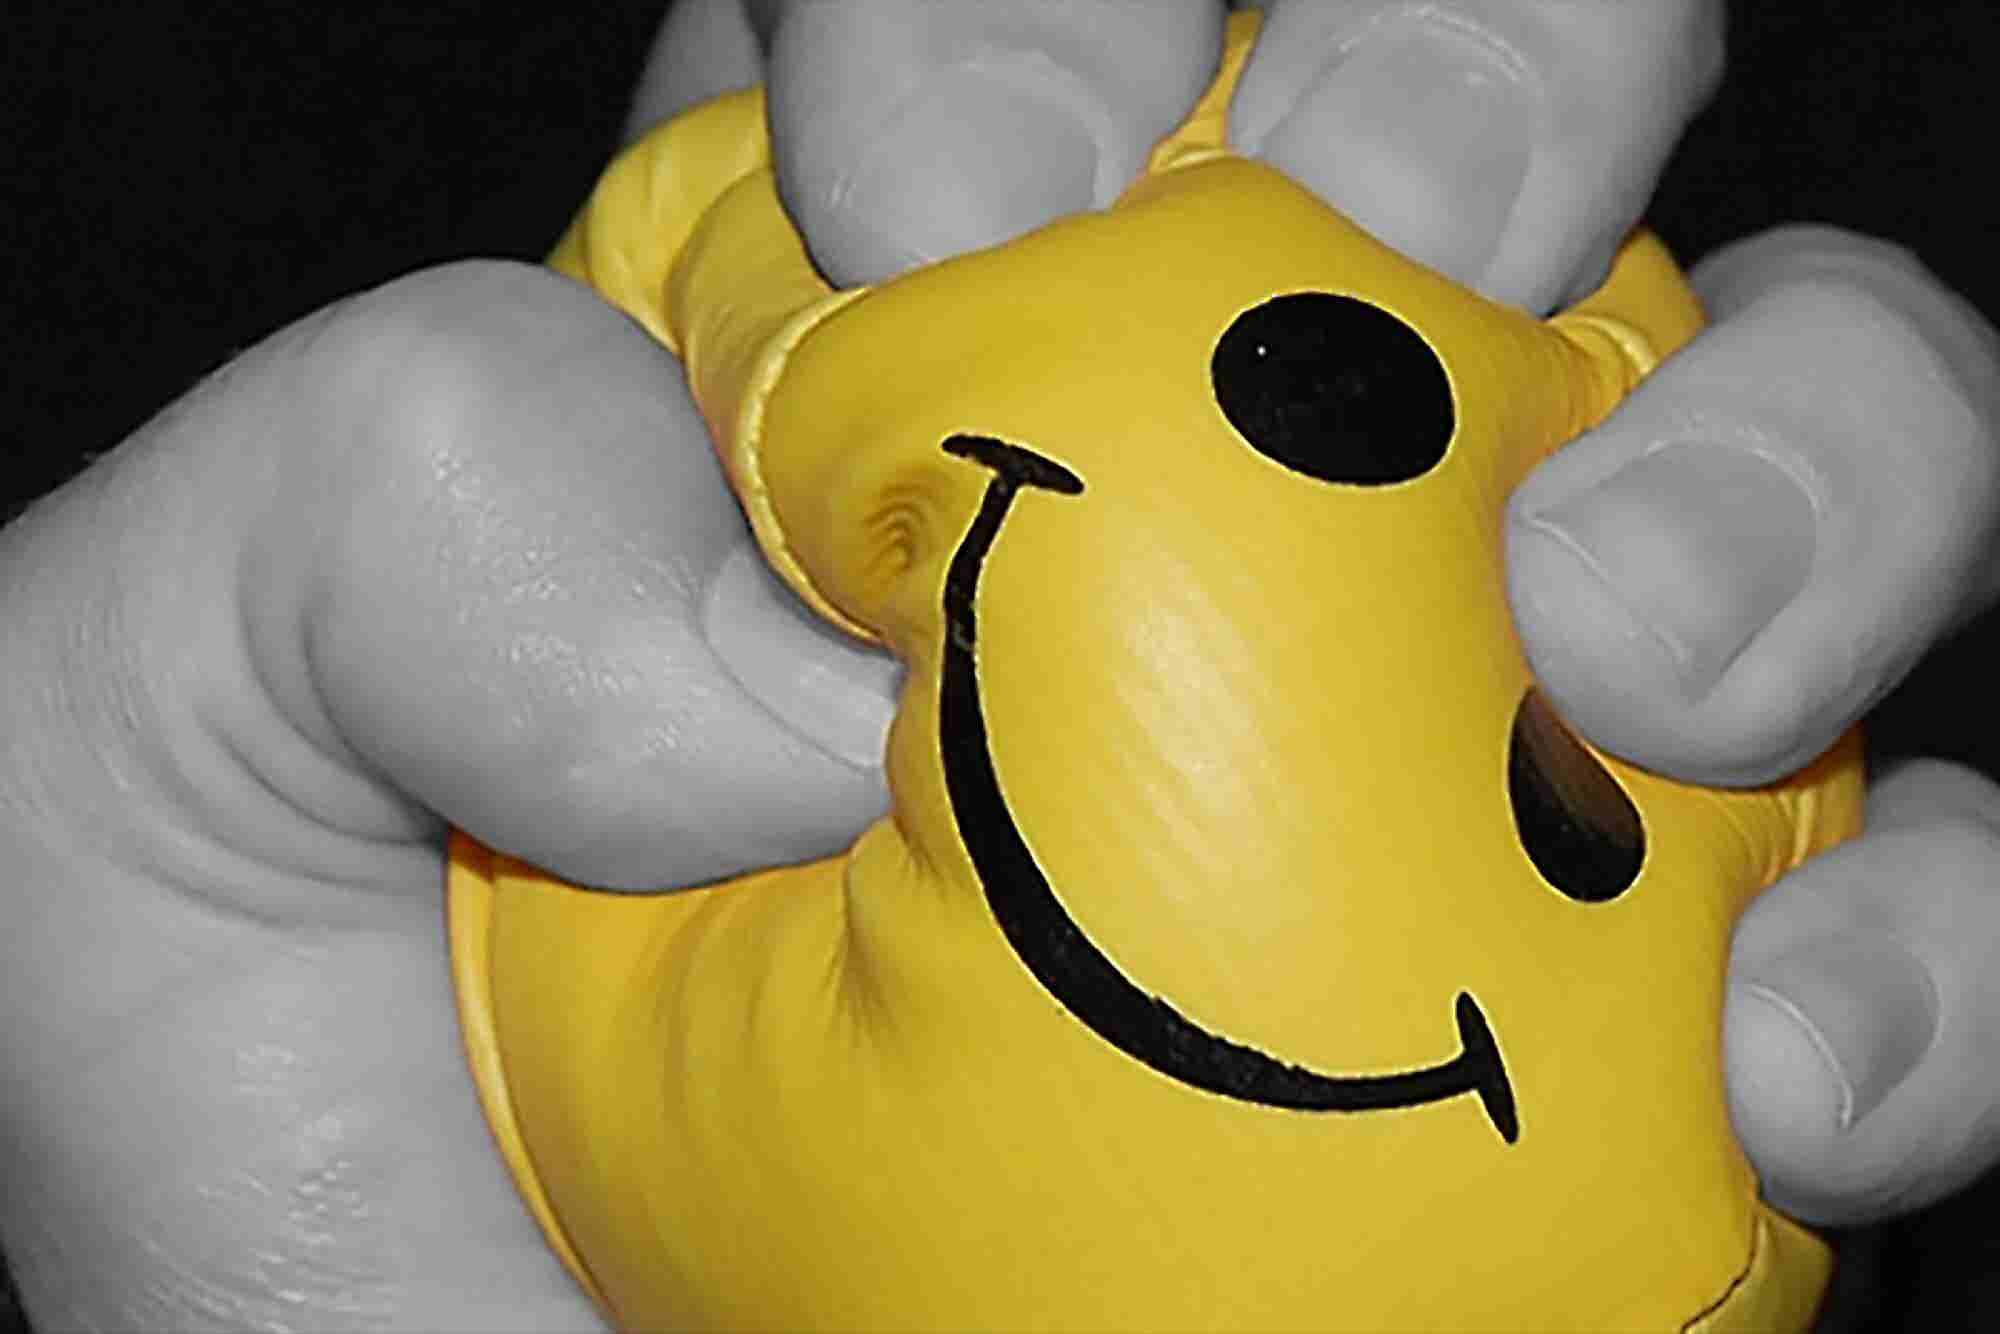 10 Easy Ways to Minimize Stress